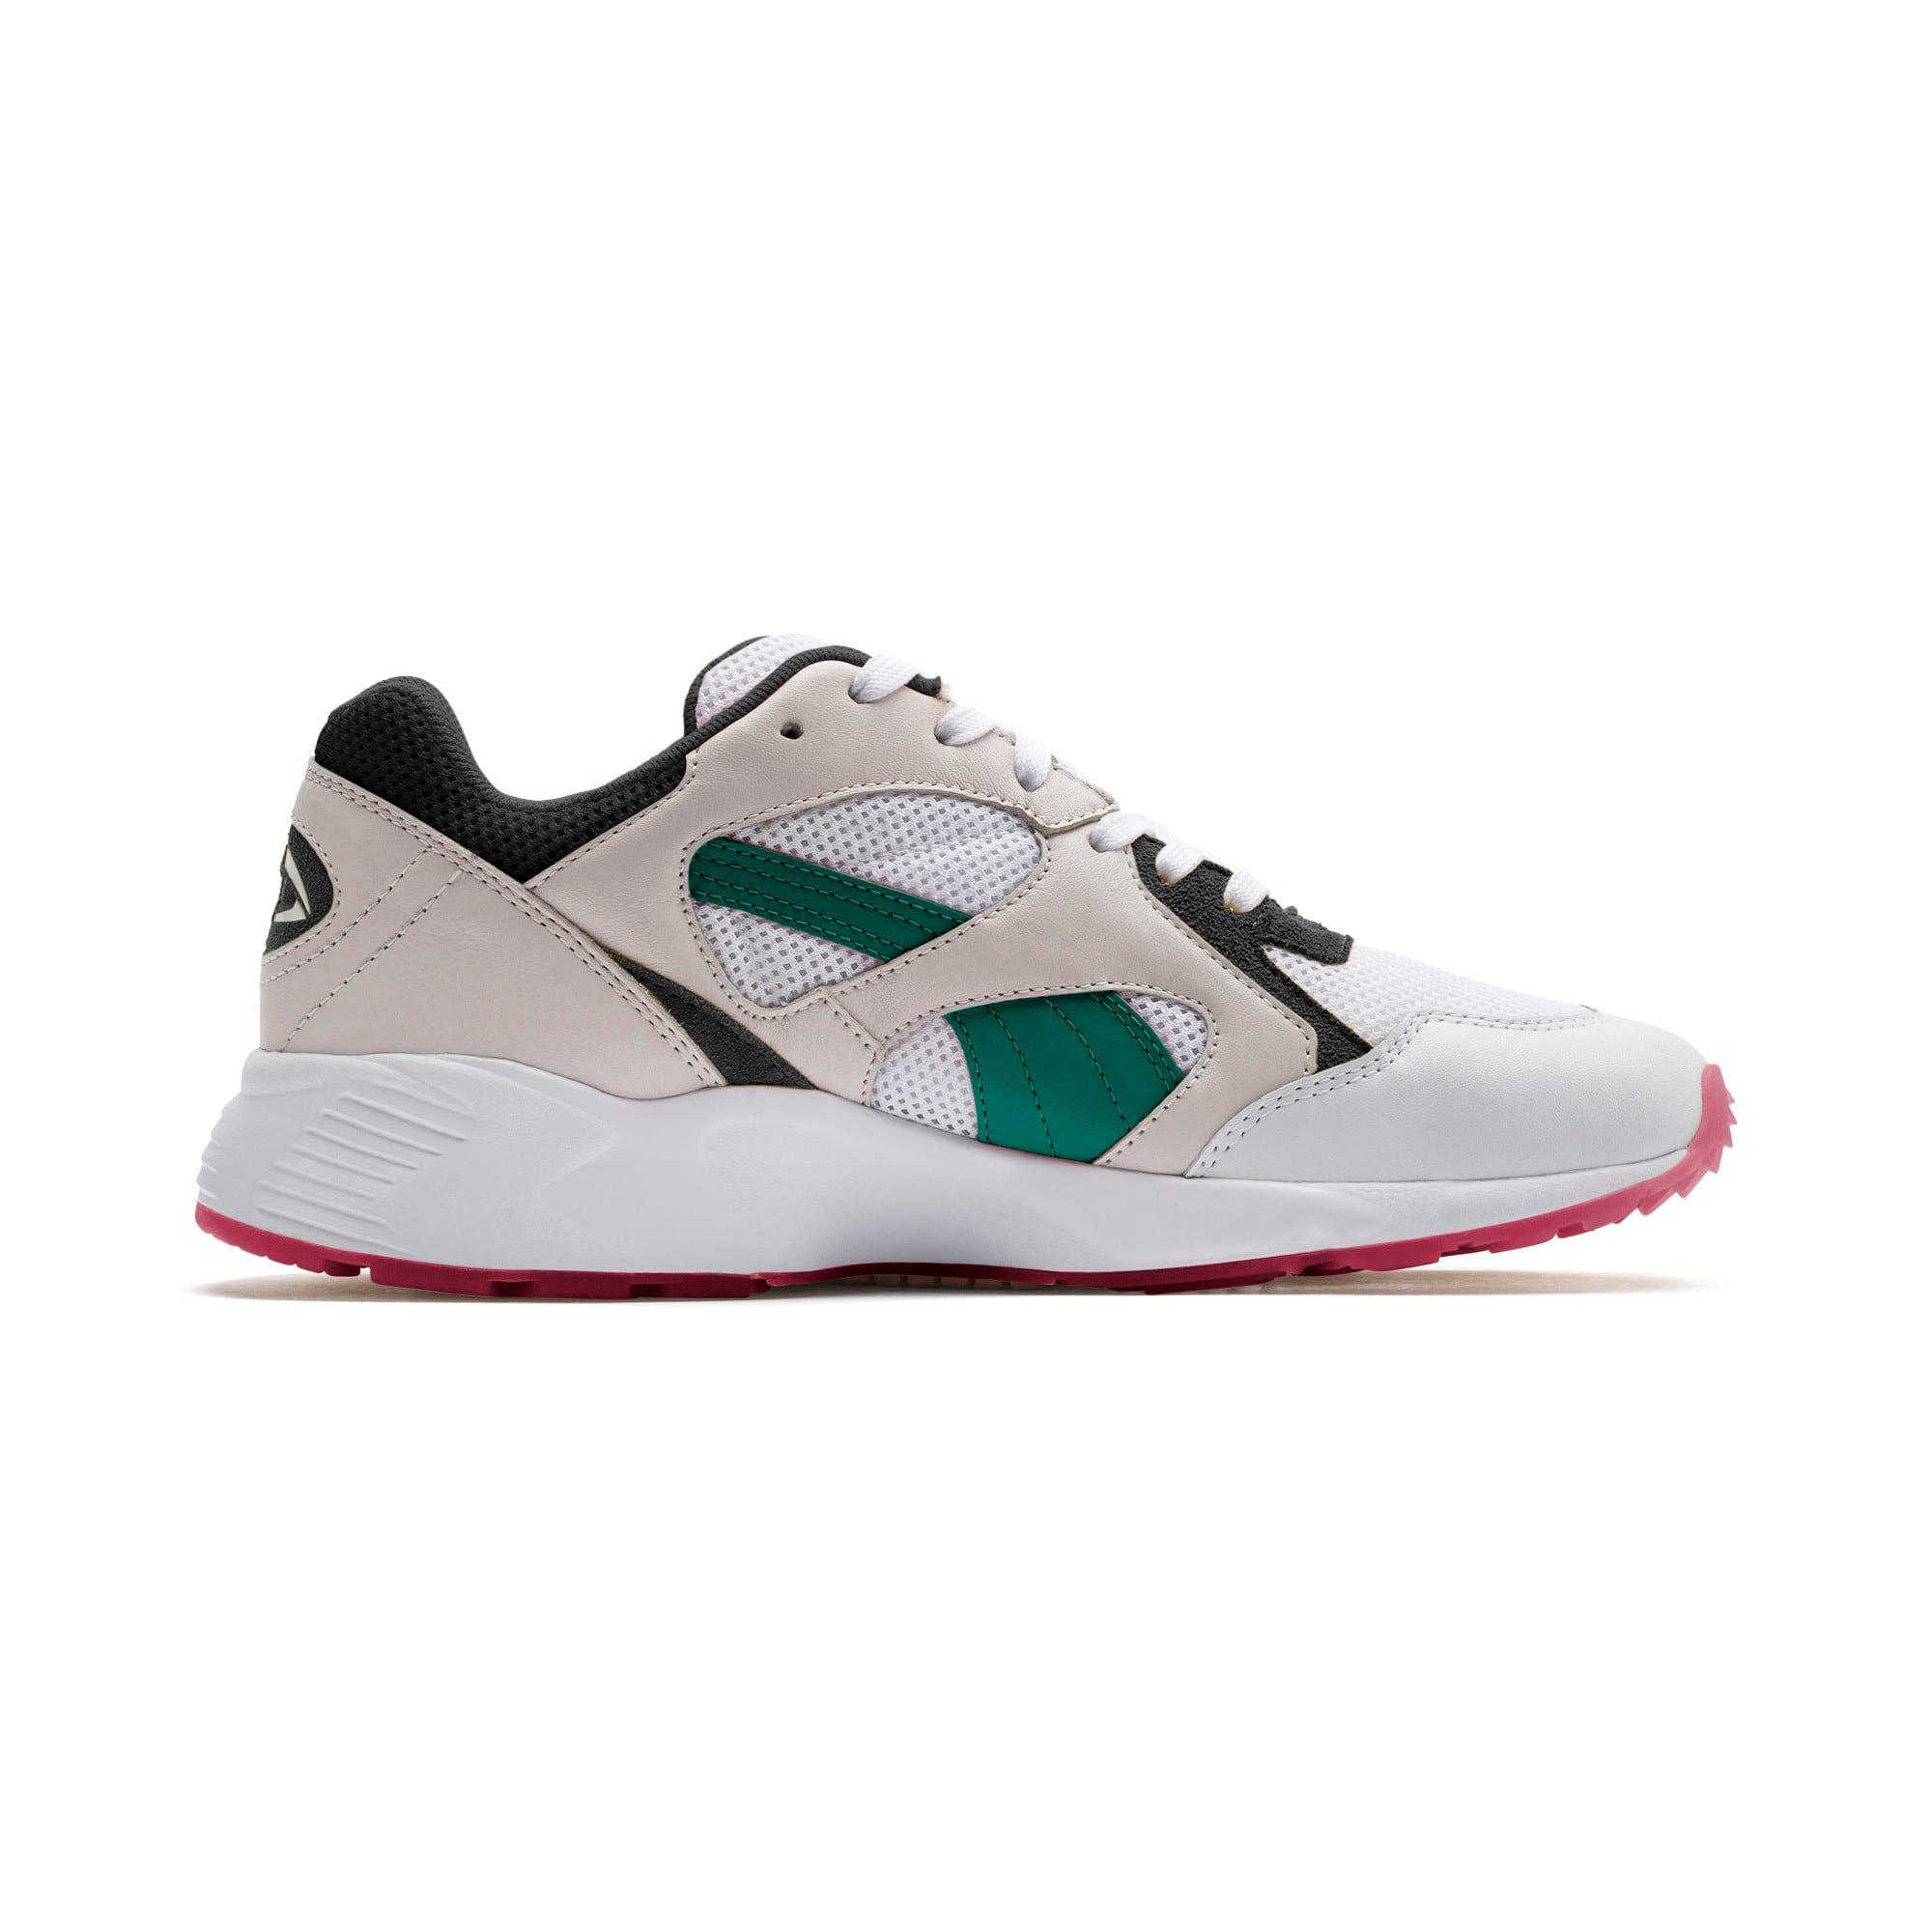 Thumbnail 5 of Prevail Classic Sneakers, Puma White-Teal Green, medium